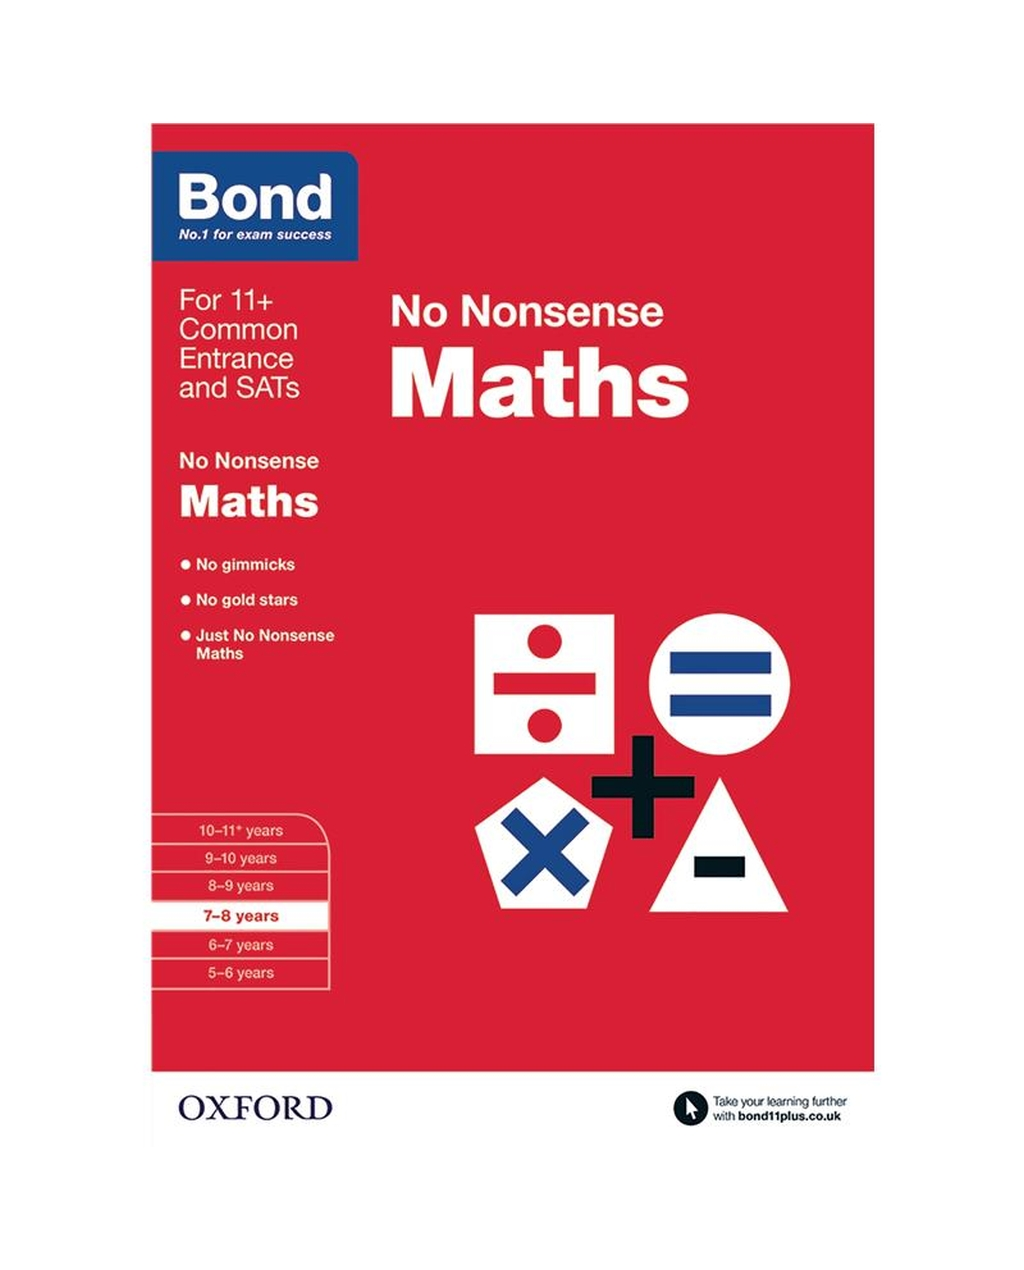 Bond: Maths No Nonsense 7-8 Years